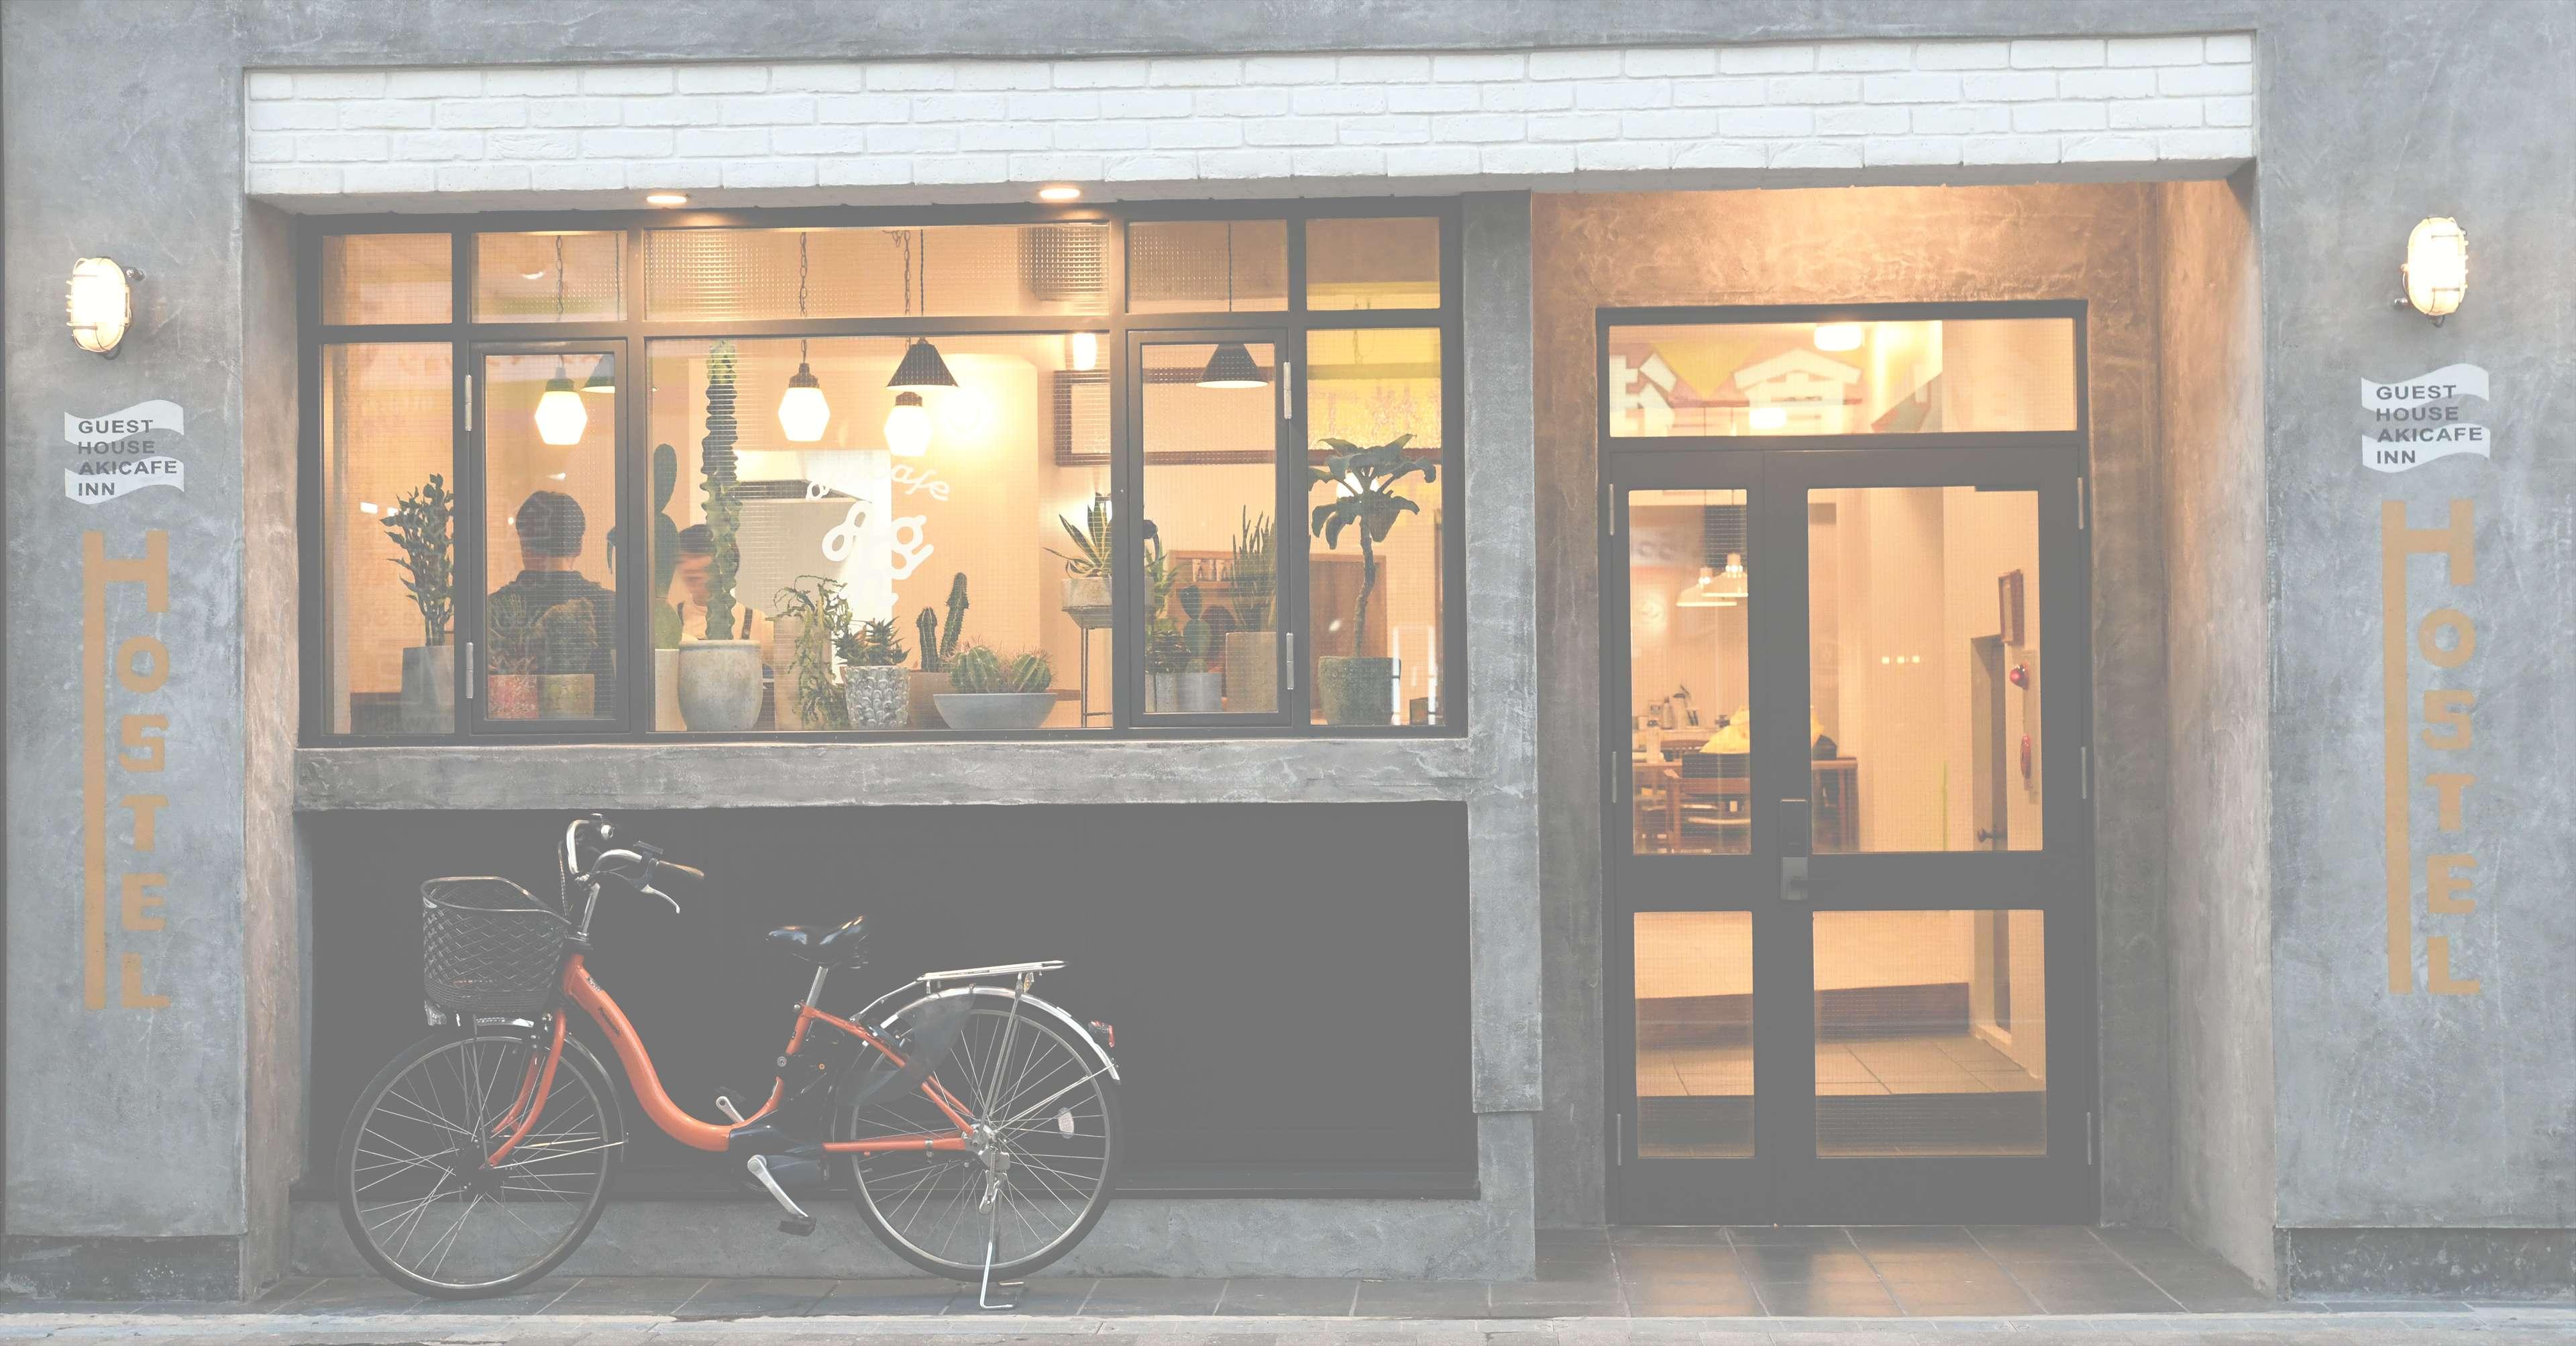 akicafe inn guesthouseのカフェの画像